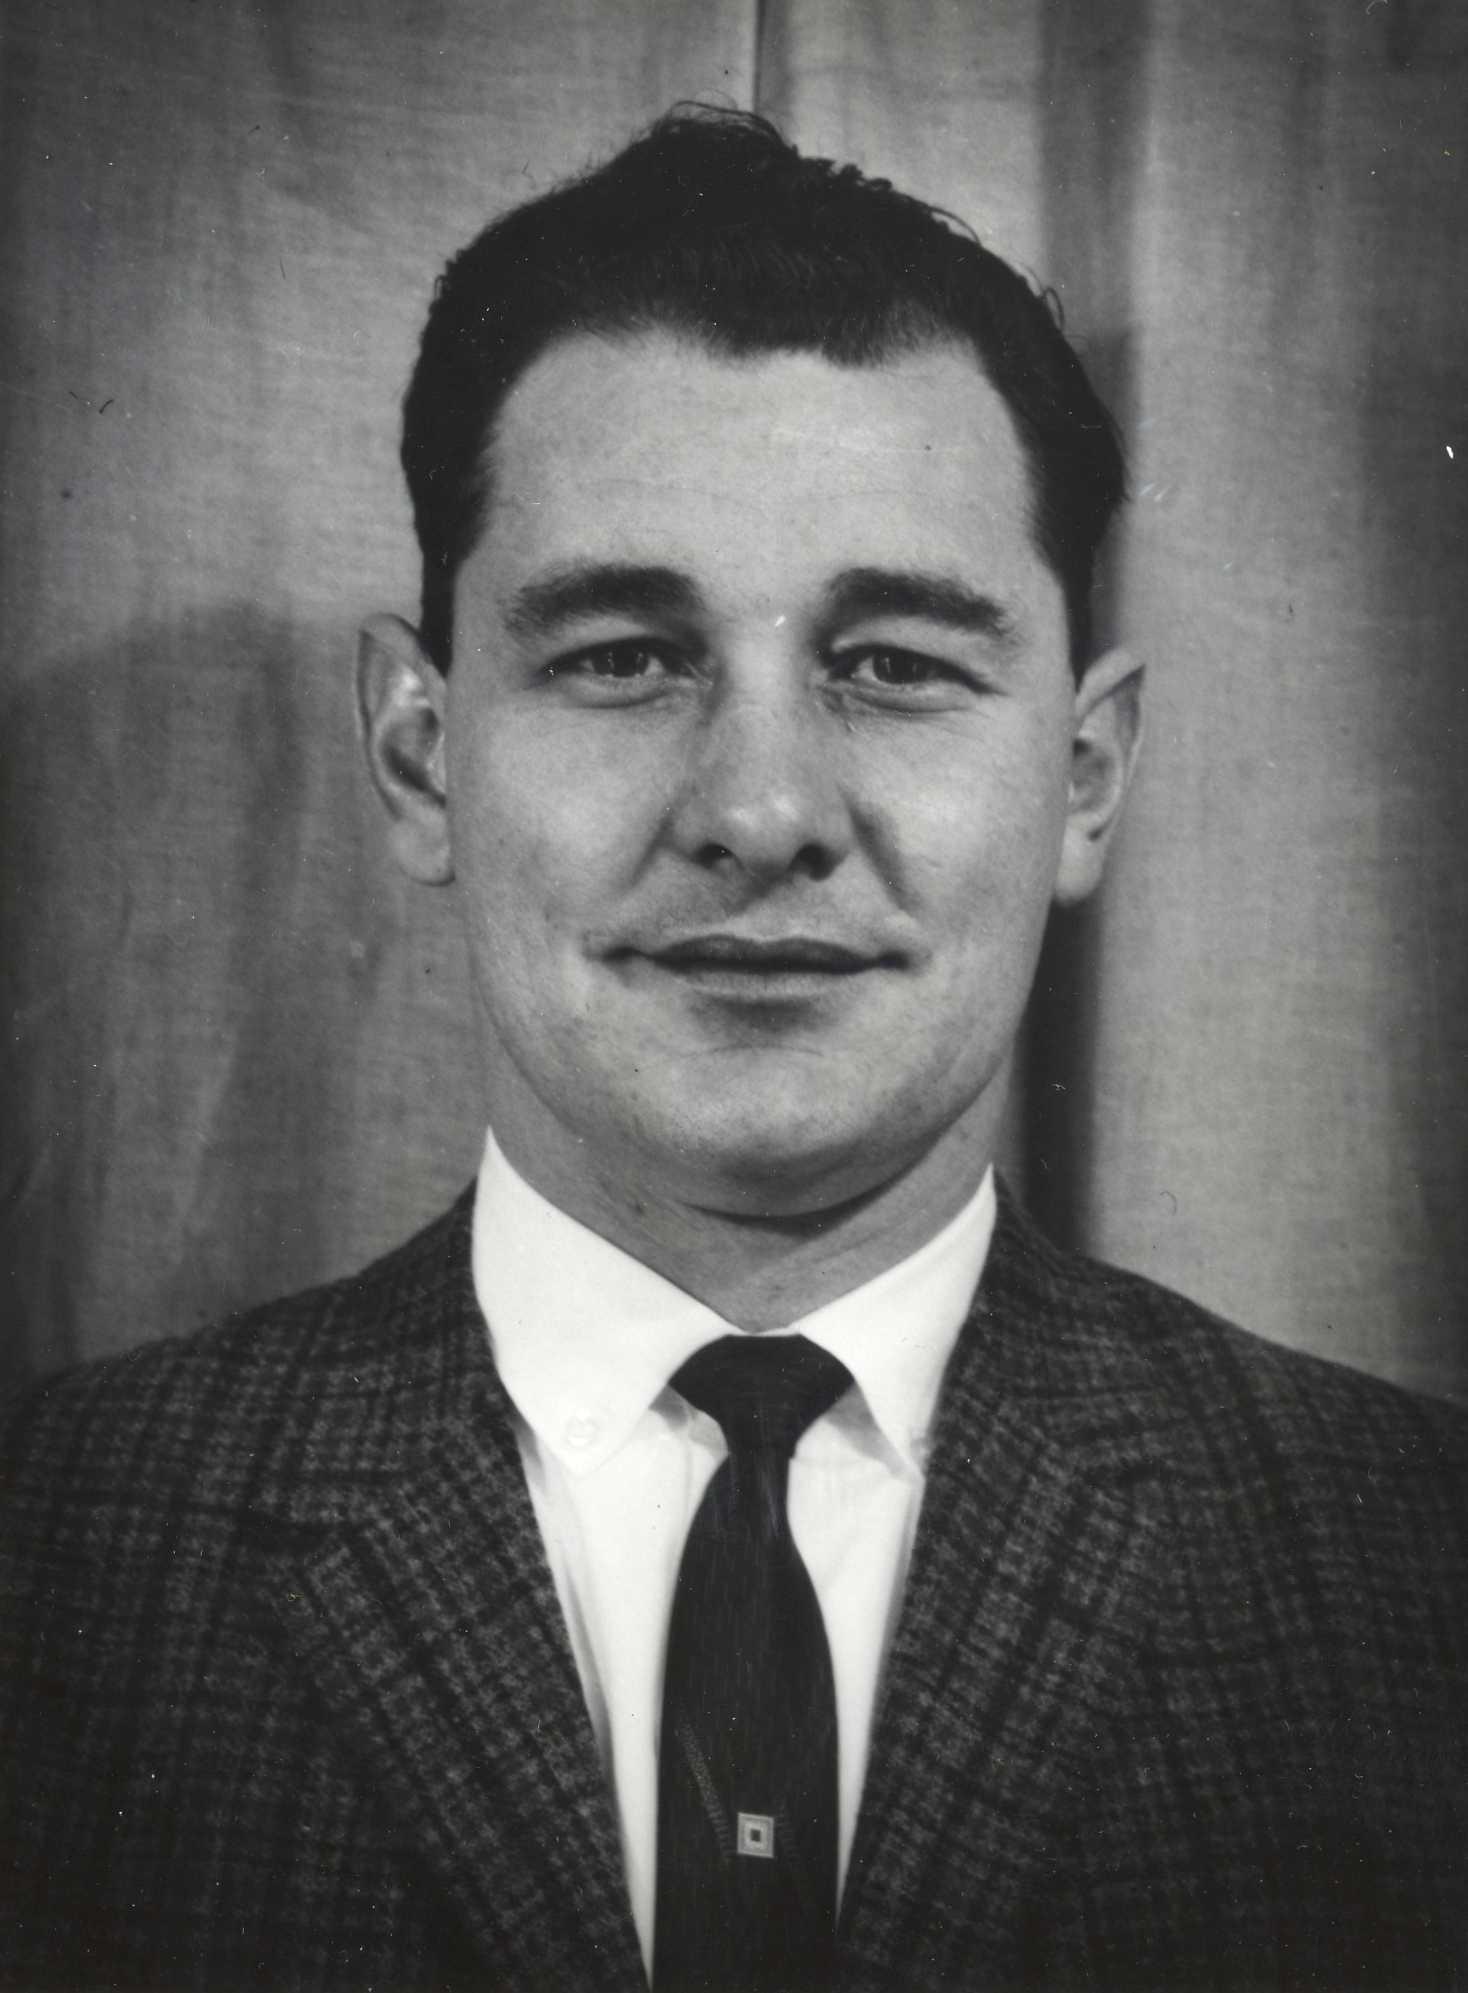 Detective George A. Schmidling   Waukesha Police Department, Wisconsin